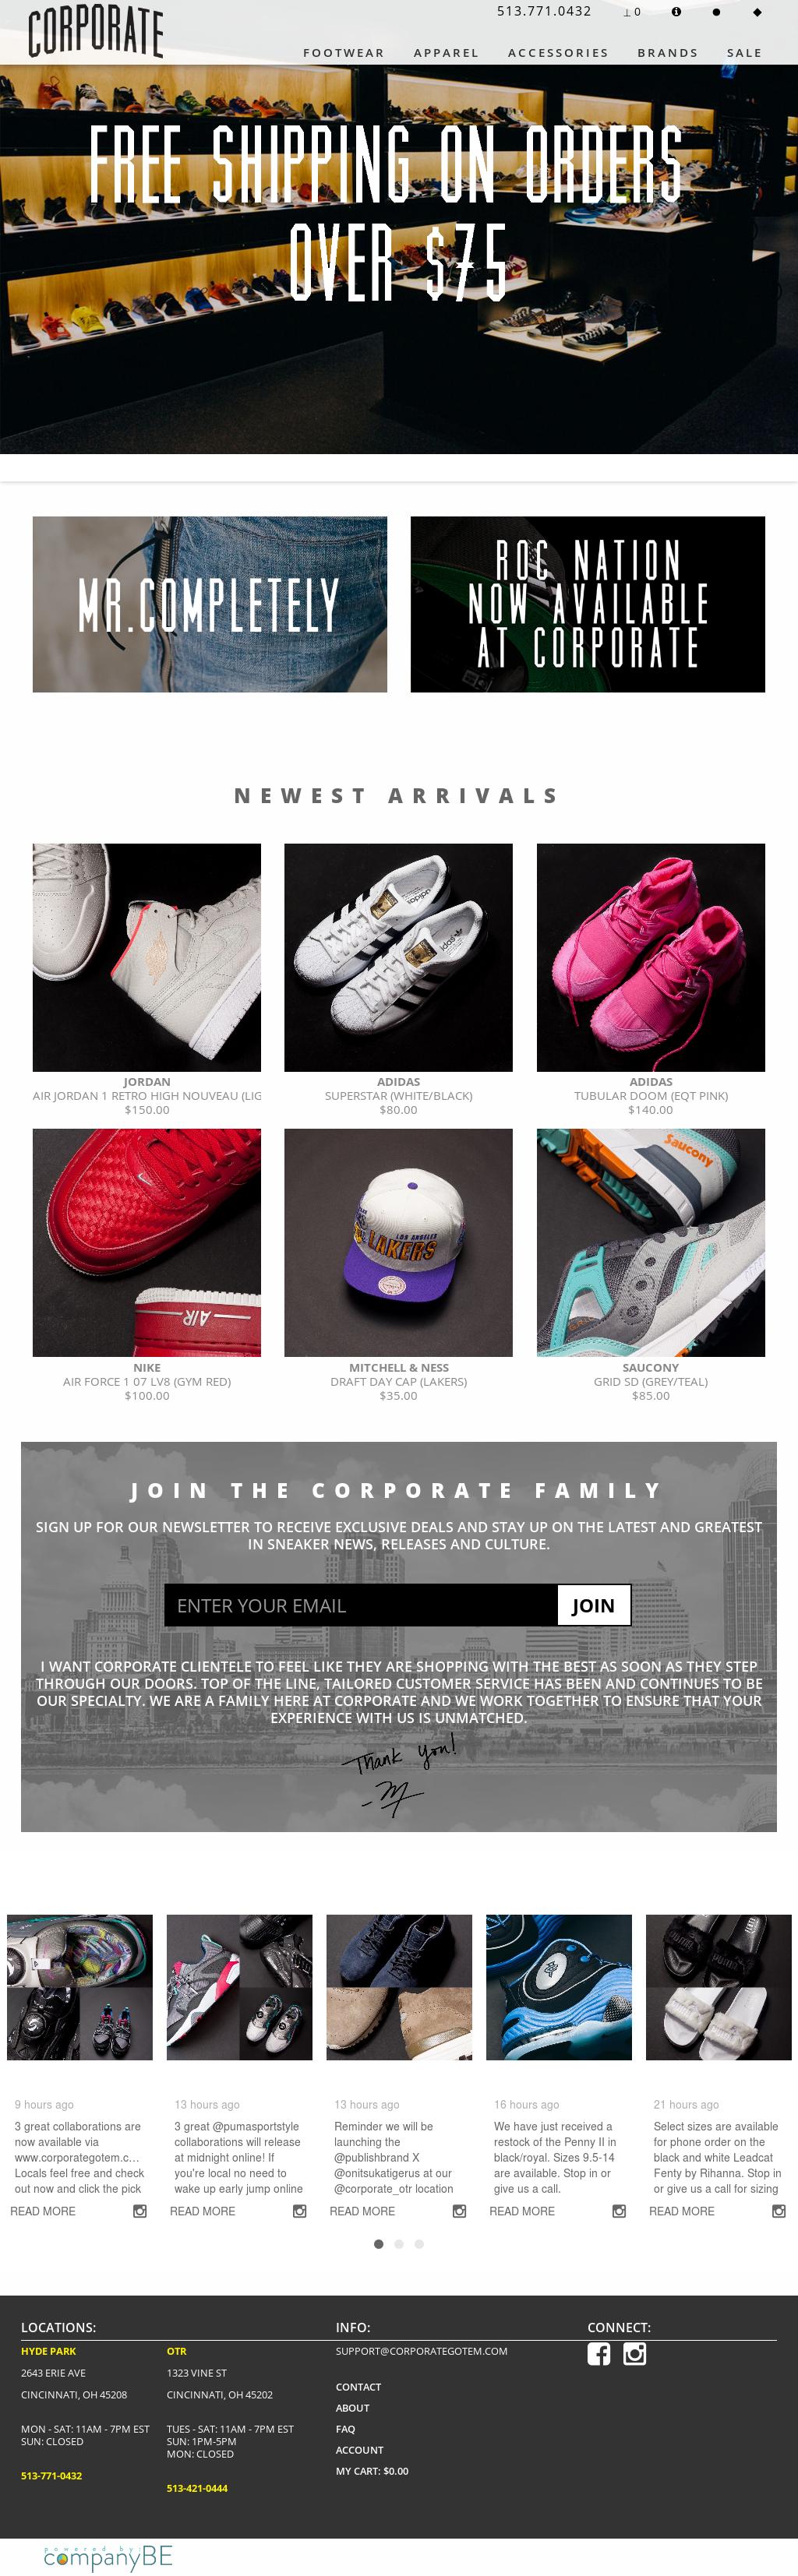 b31de735c5 Corporategotem Competitors, Revenue and Employees - Owler Company ...